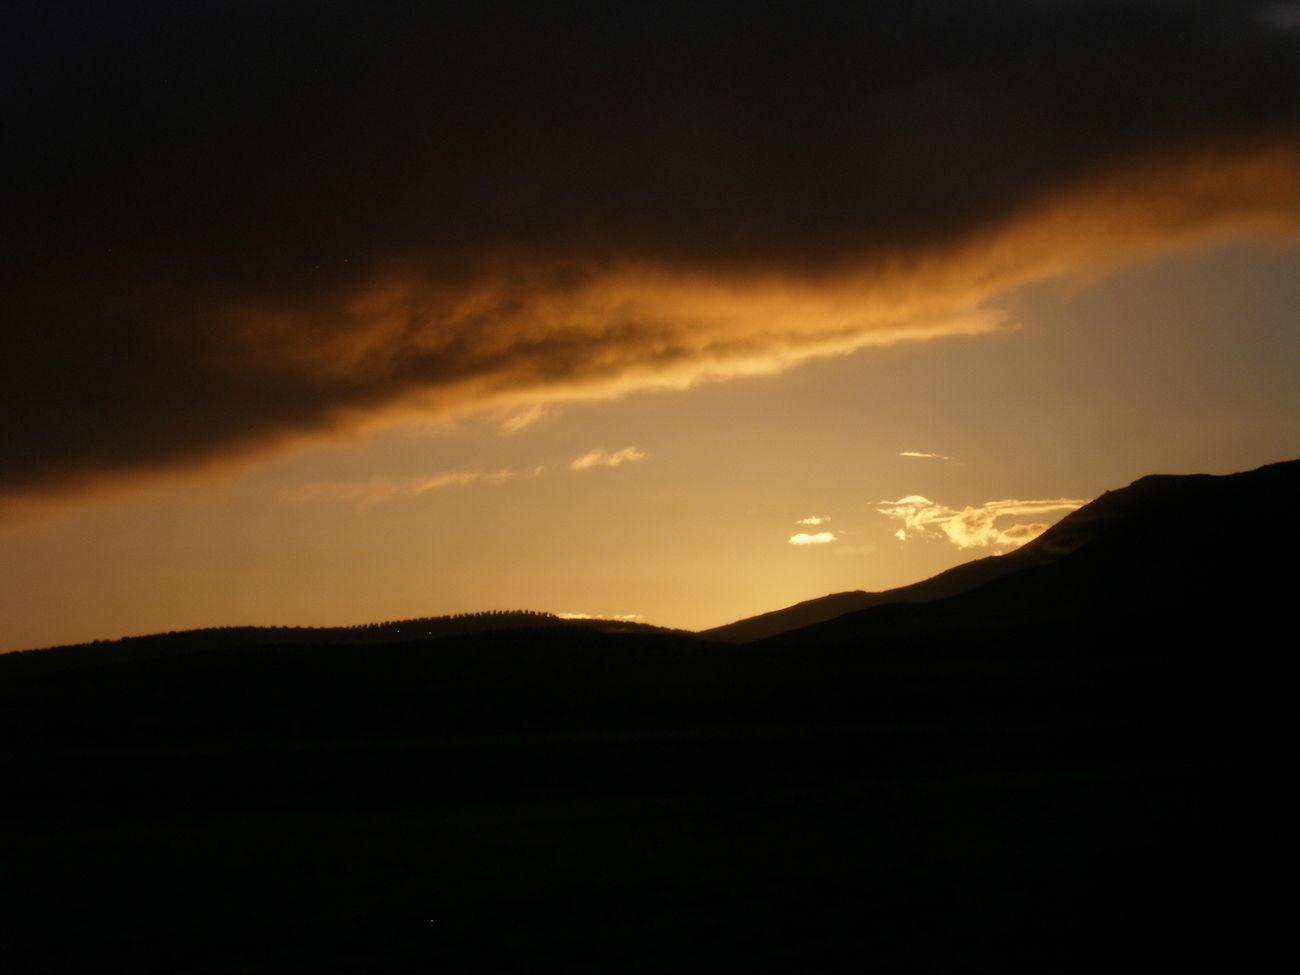 Viajar en autobus. Líneas convergentes IISunset Sky Mountain Nature Beauty In Nature Cloud - Sky No People Lineas Lines Cloud Nube Clouds Nubes Cielo Naranja Orangesky Naranjas Tesis99 Atardecer Bus Autobus Viajar Scenics Tranquility Convergent